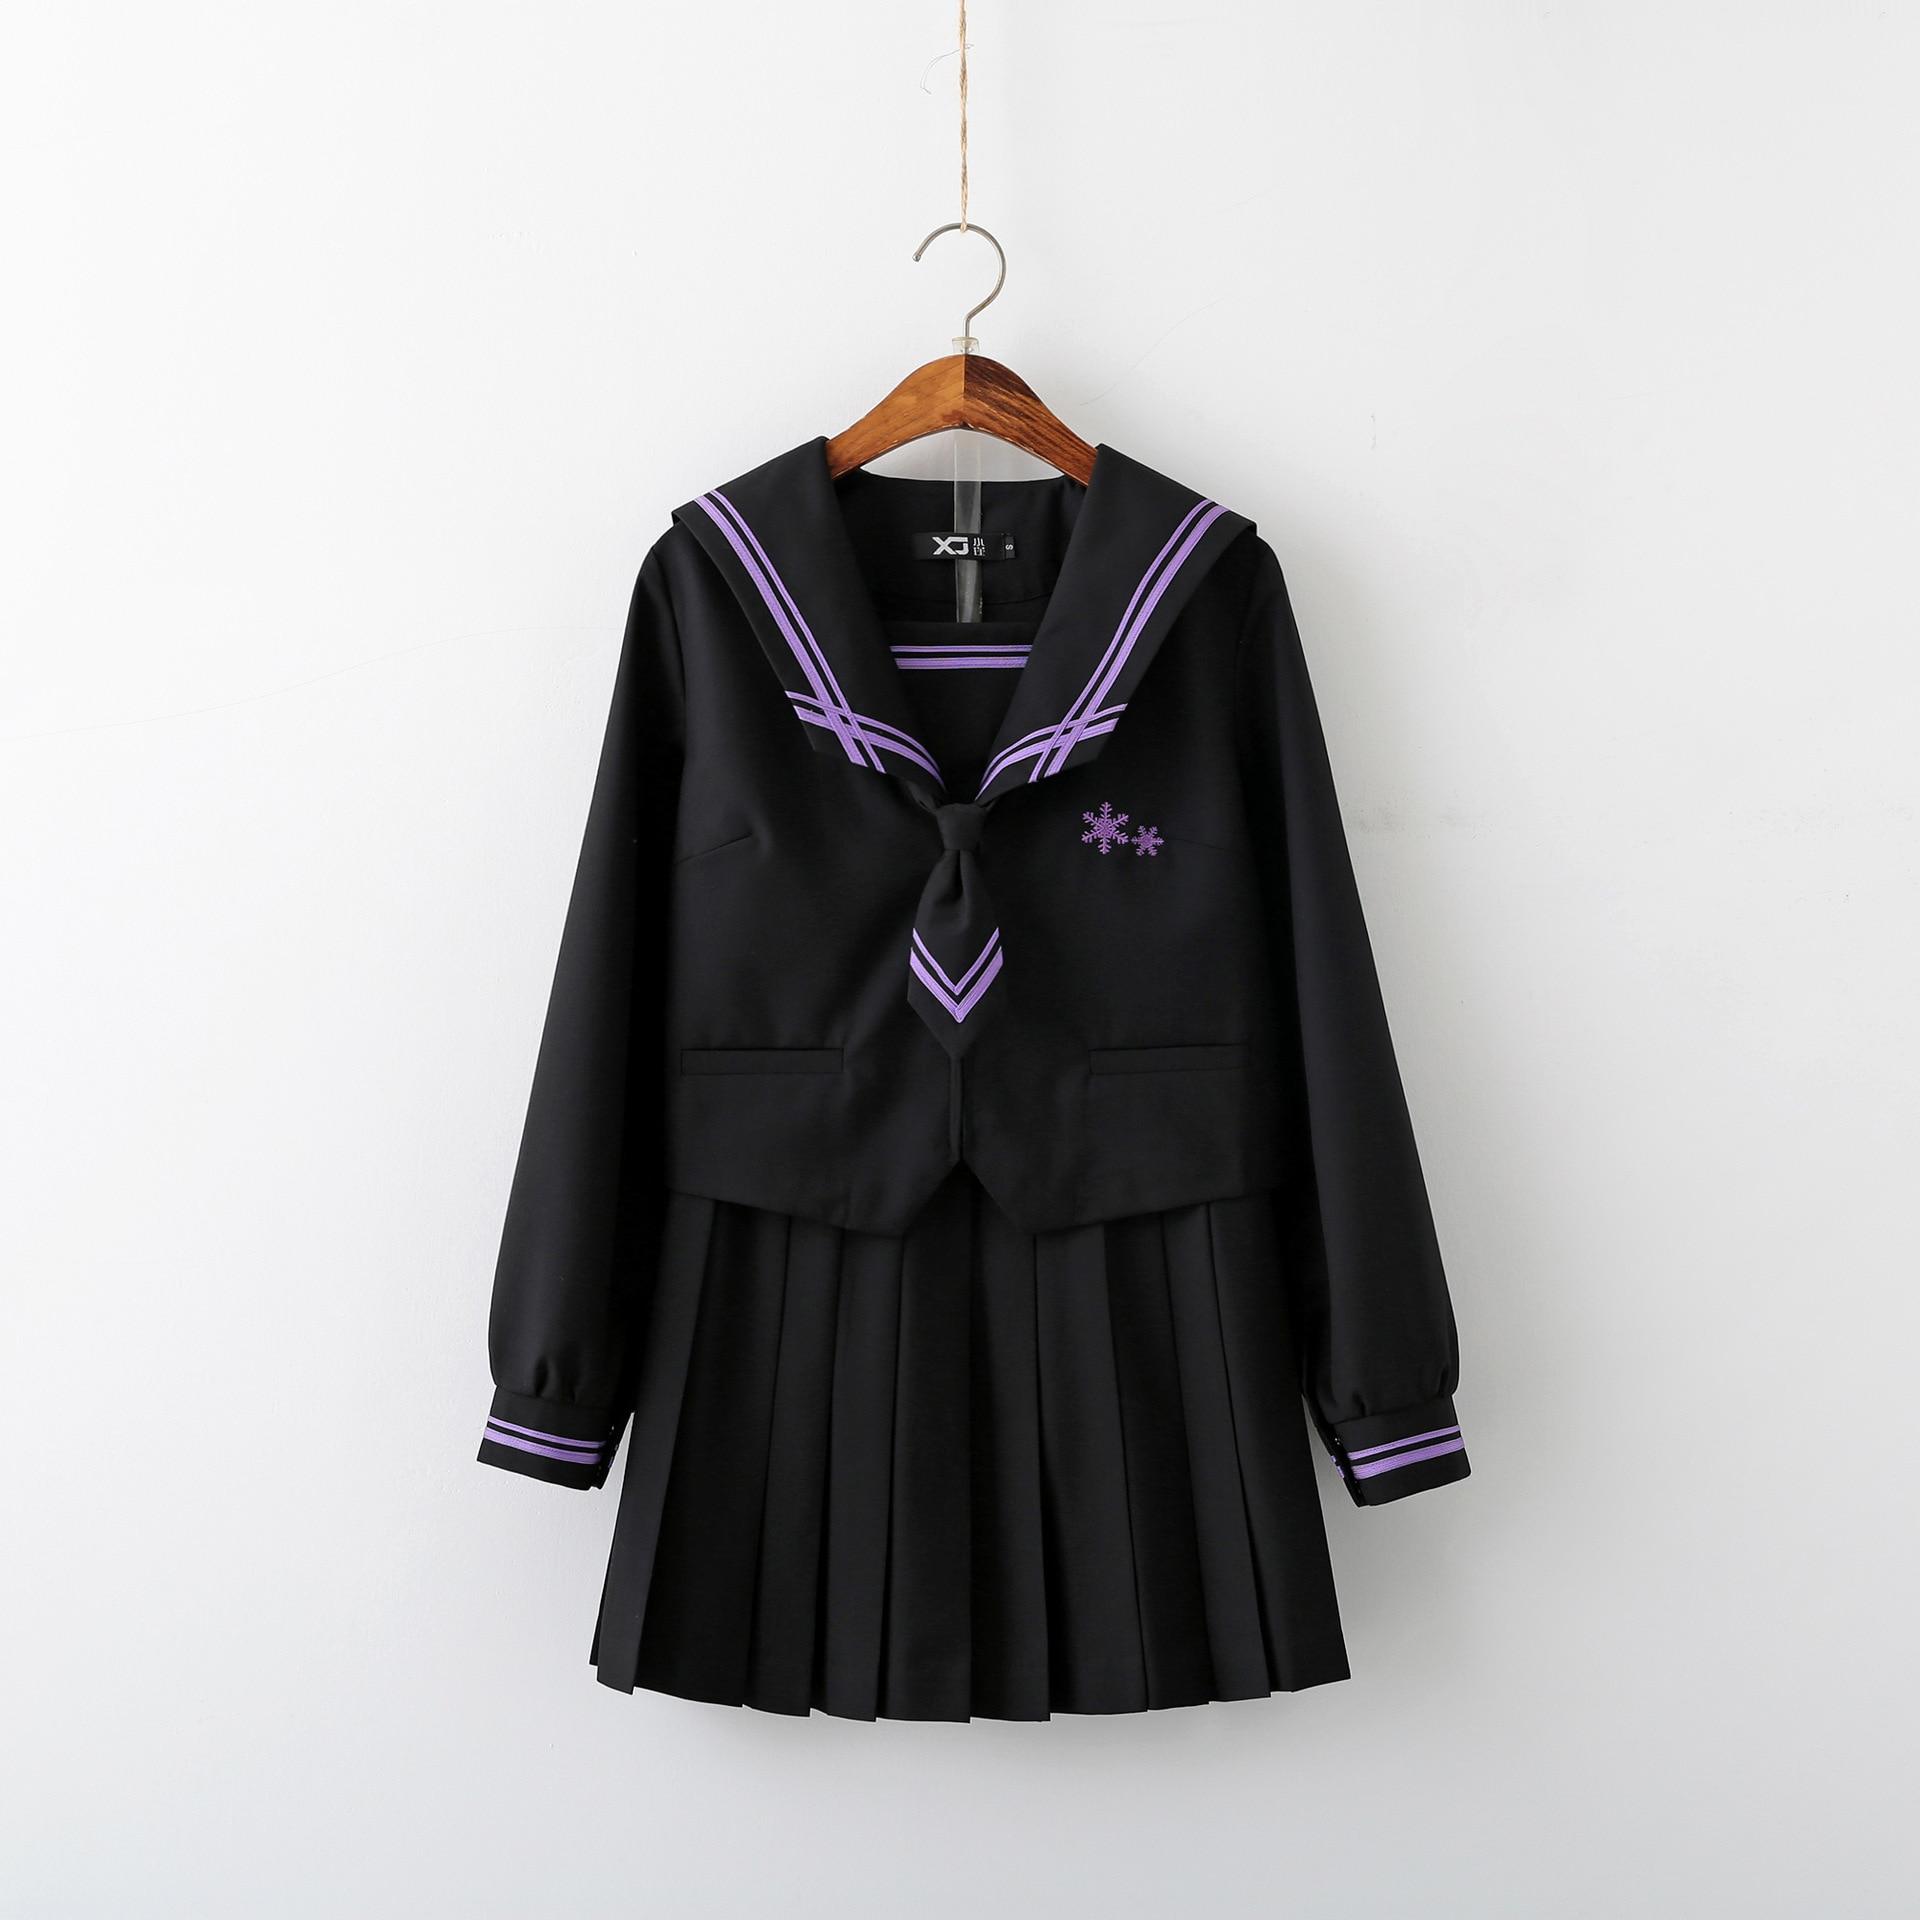 Japanese Fashion School JK Uniform Japones Sailor Fuku Uniforme Japonais School Girl Students Costume Tops Pleated Skirt